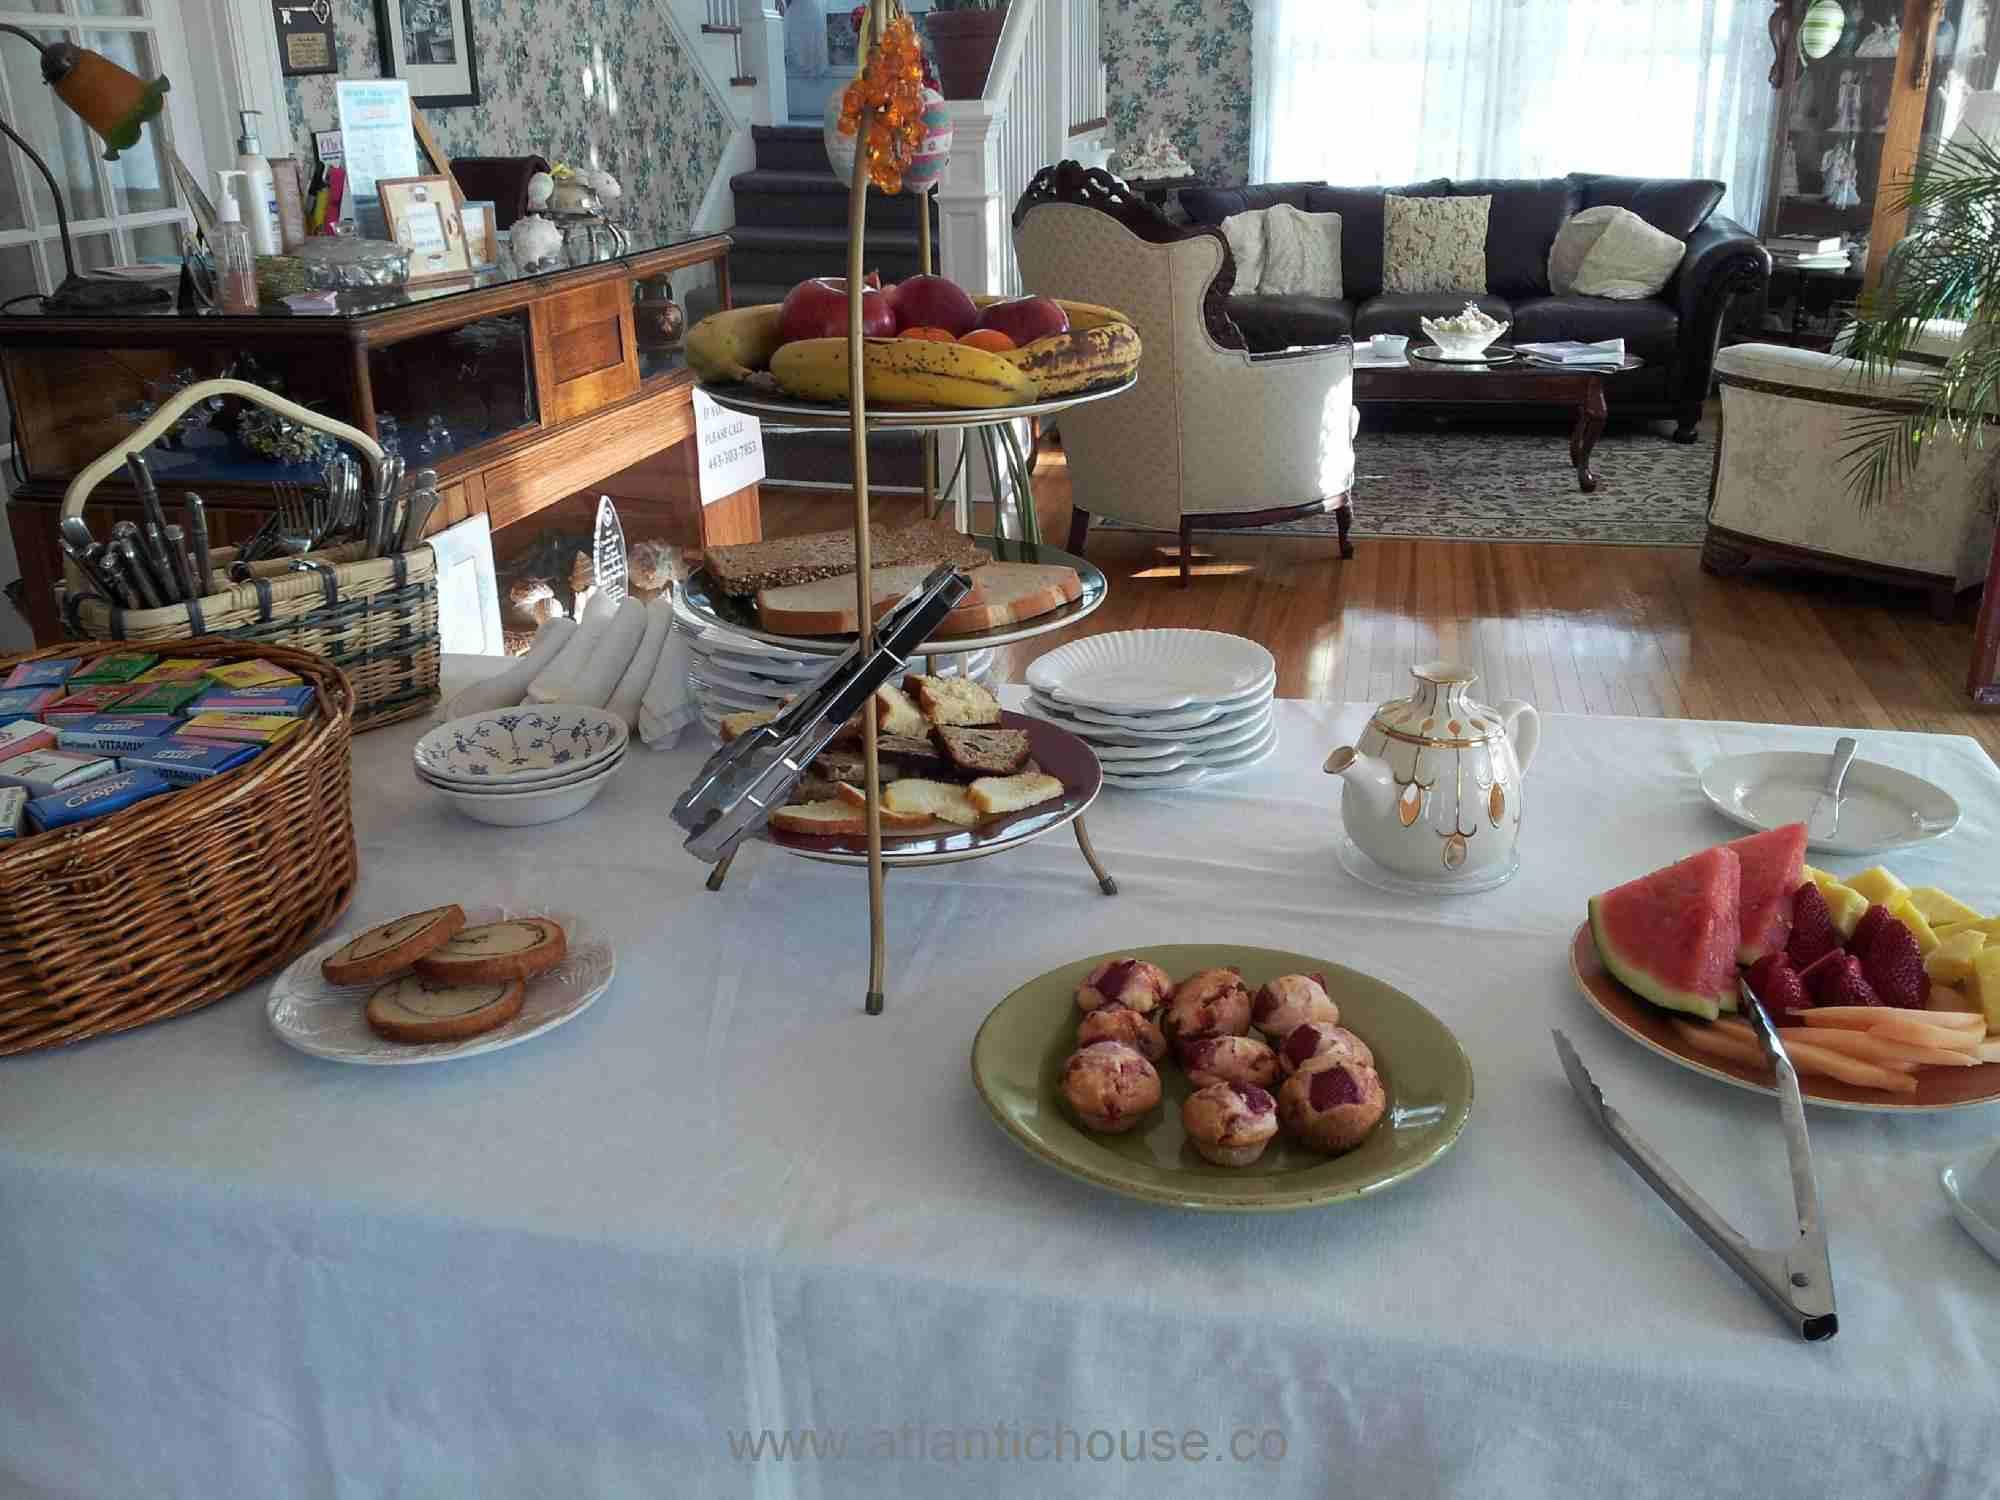 Full Buffet breakfast served every morning